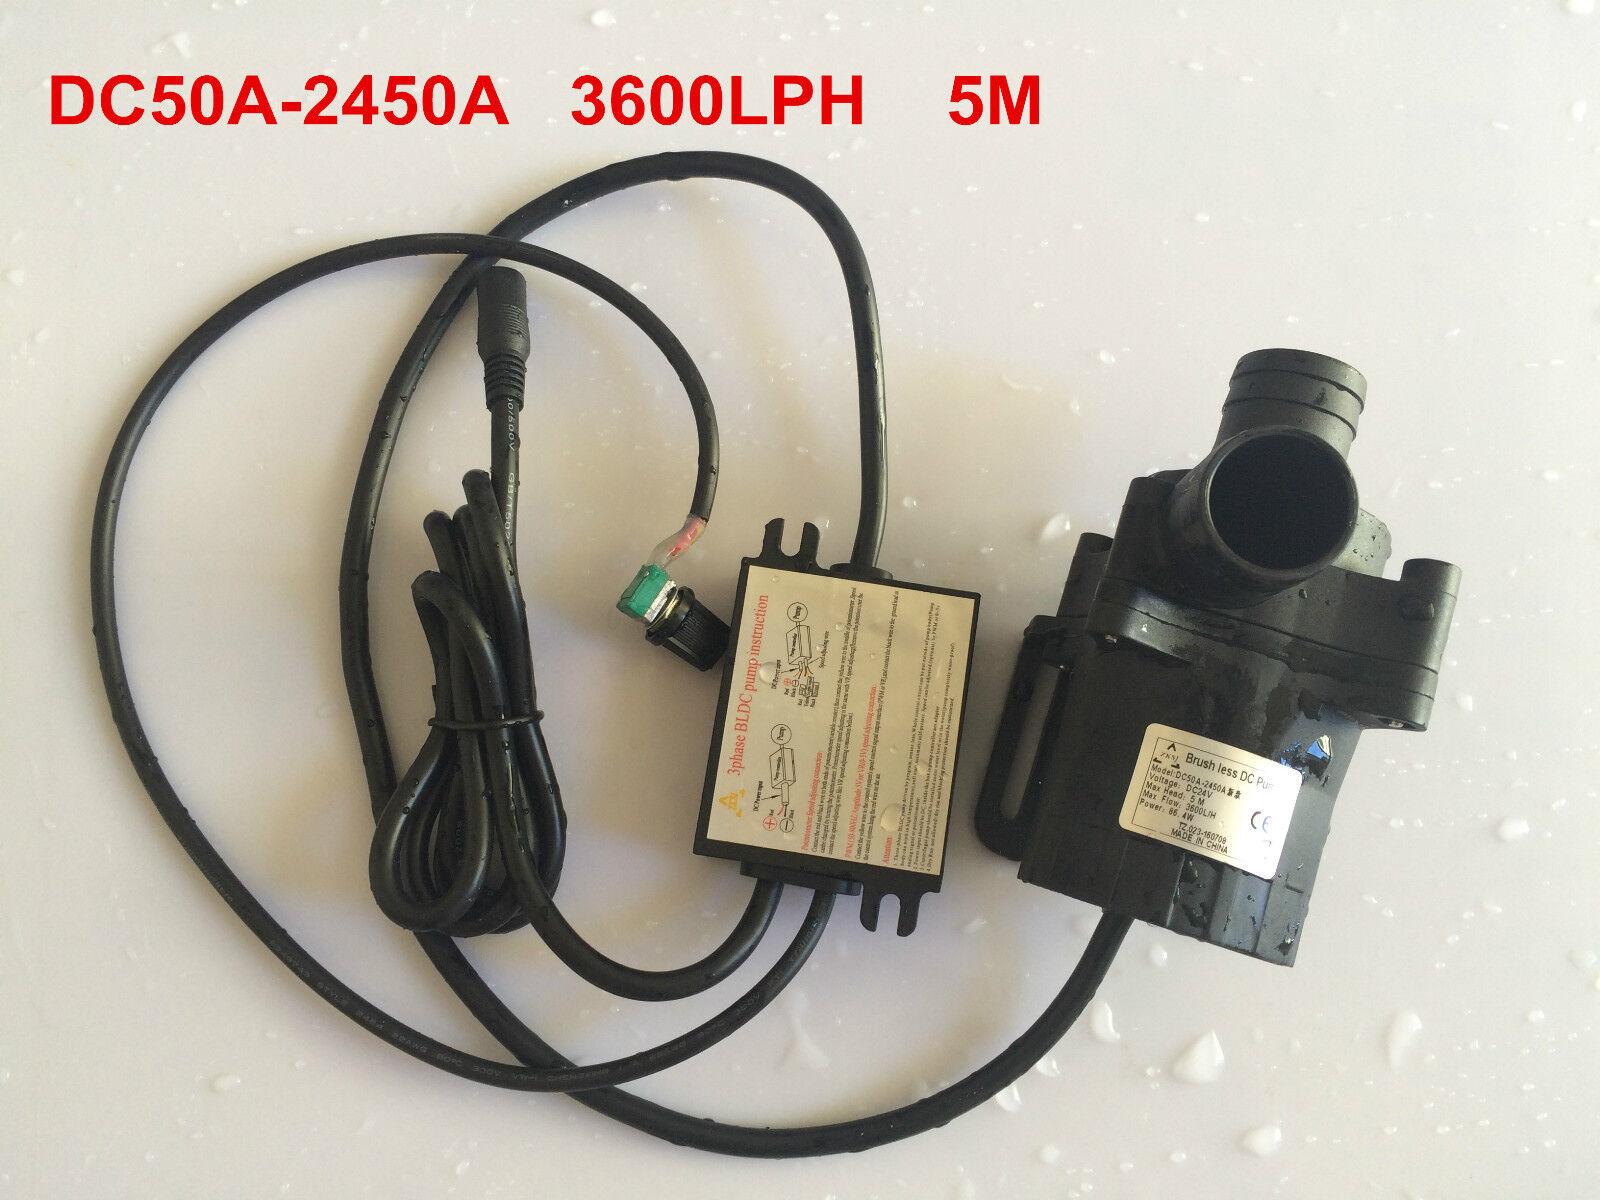 Velocidad ajustable 5-24V 50A-2450A pequeña Detective Comics bomba de agua Bomba Sumergible 3600L H 5M